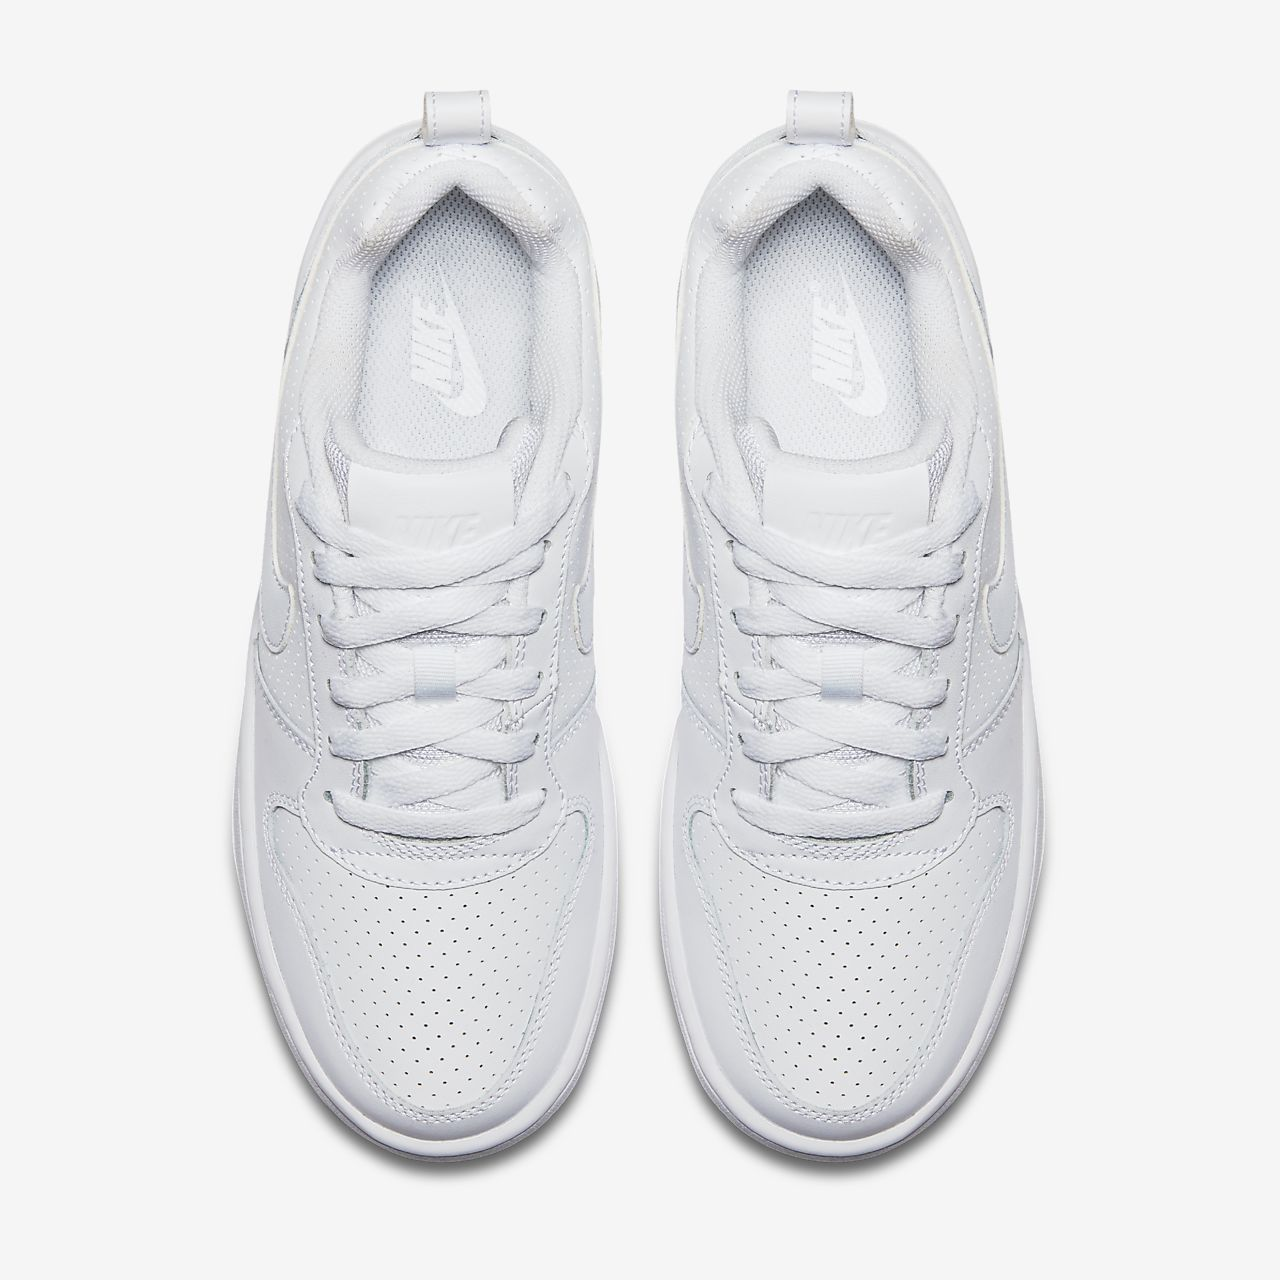 ea6fe8ecdca Nike Court Borough Low Women s Shoe. Nike.com CA